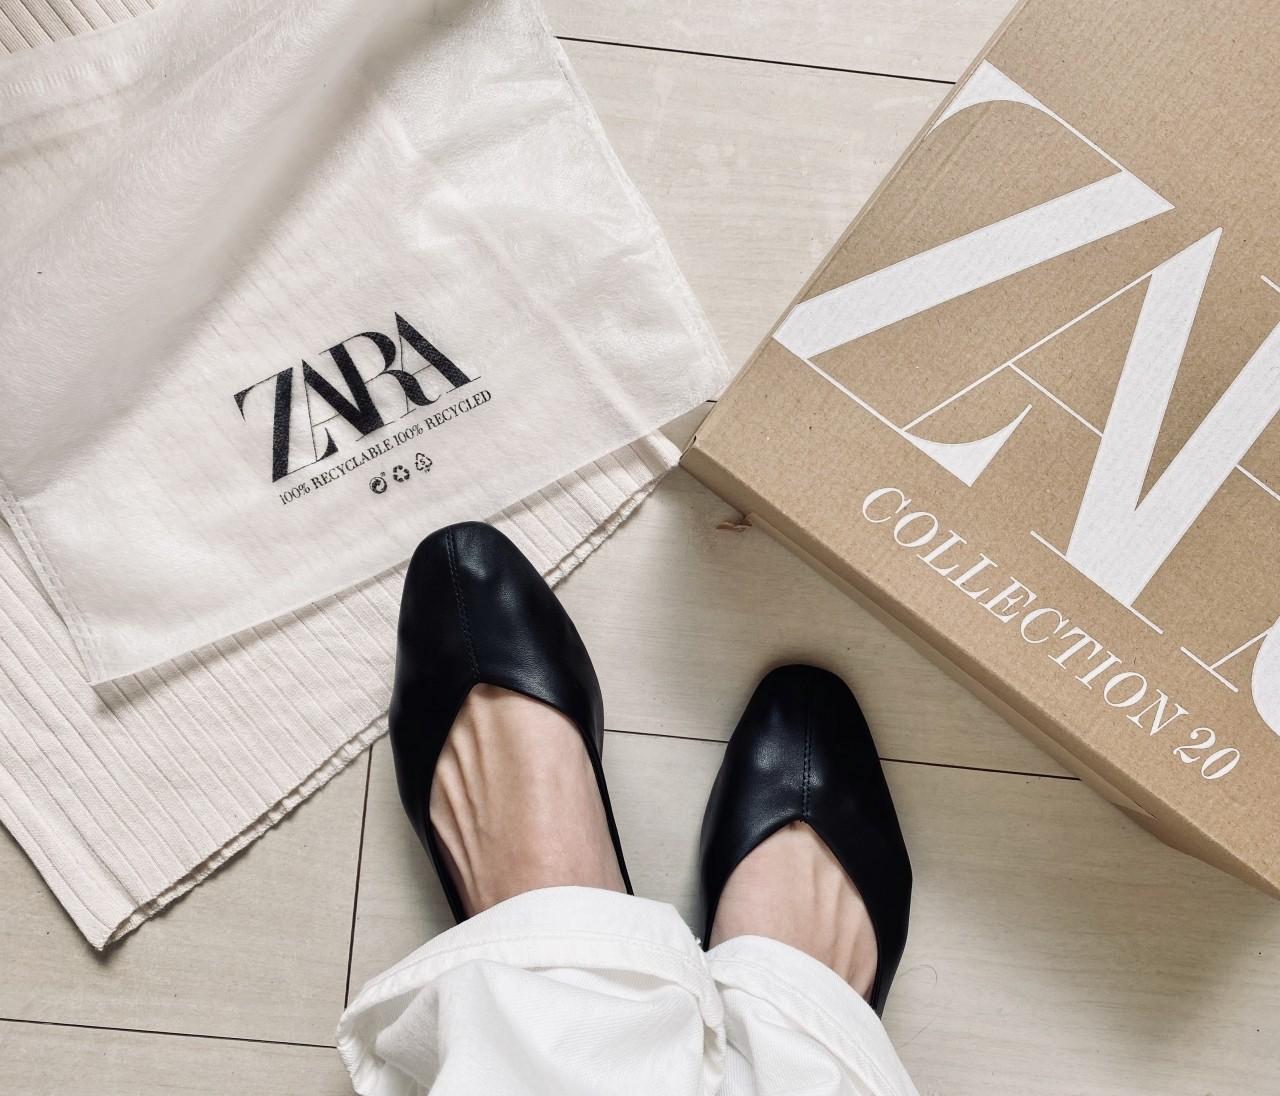 【ZARA】話題のソフトレザーバレエシューズが40%オフ!